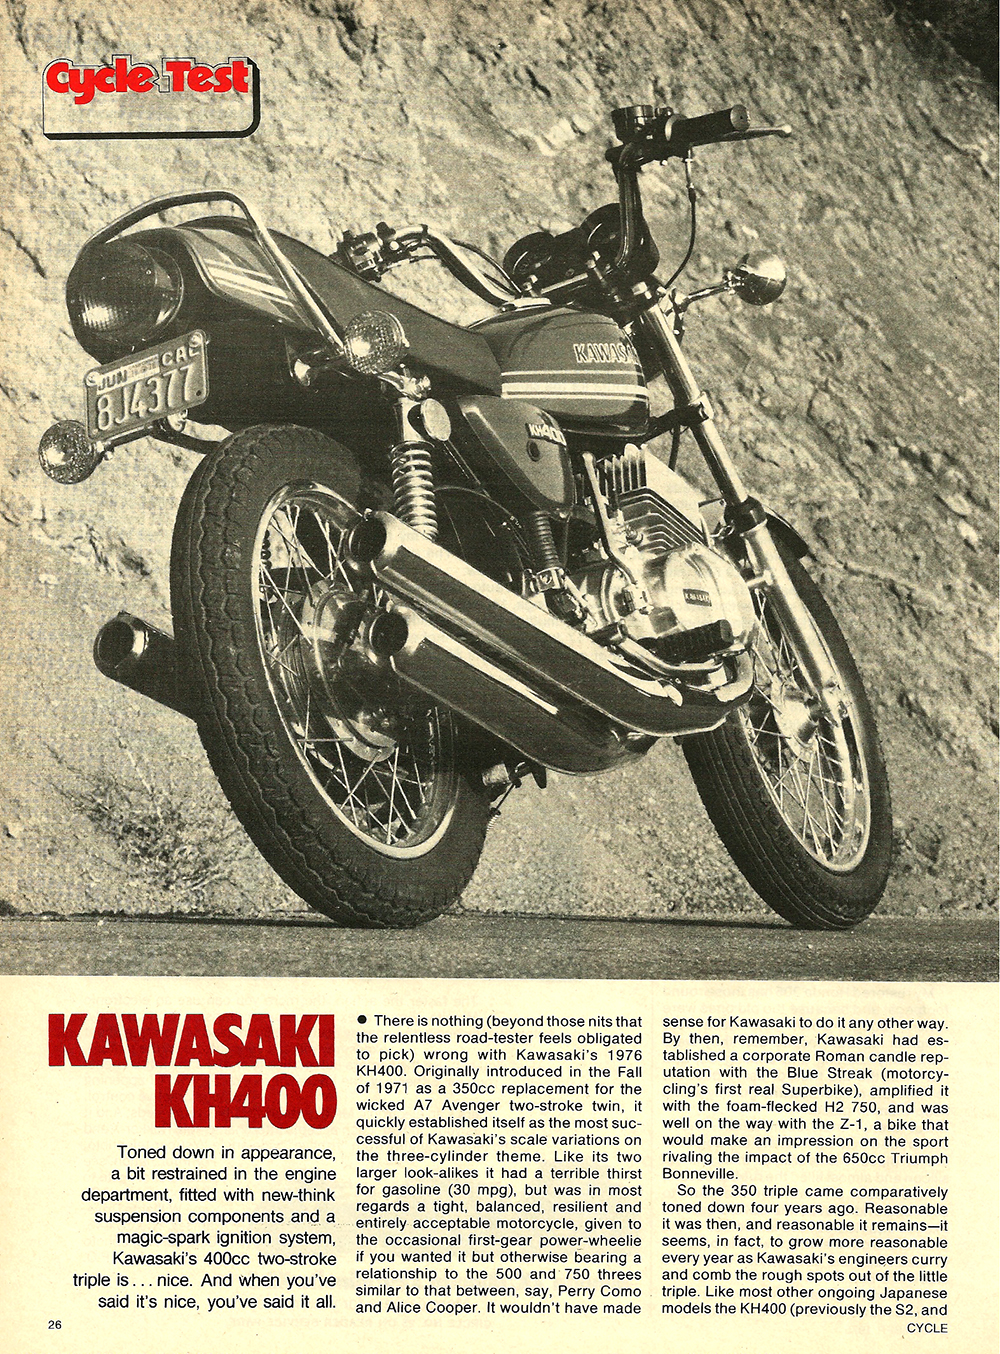 1976 Kawasaki KH400 road test 1.jpg